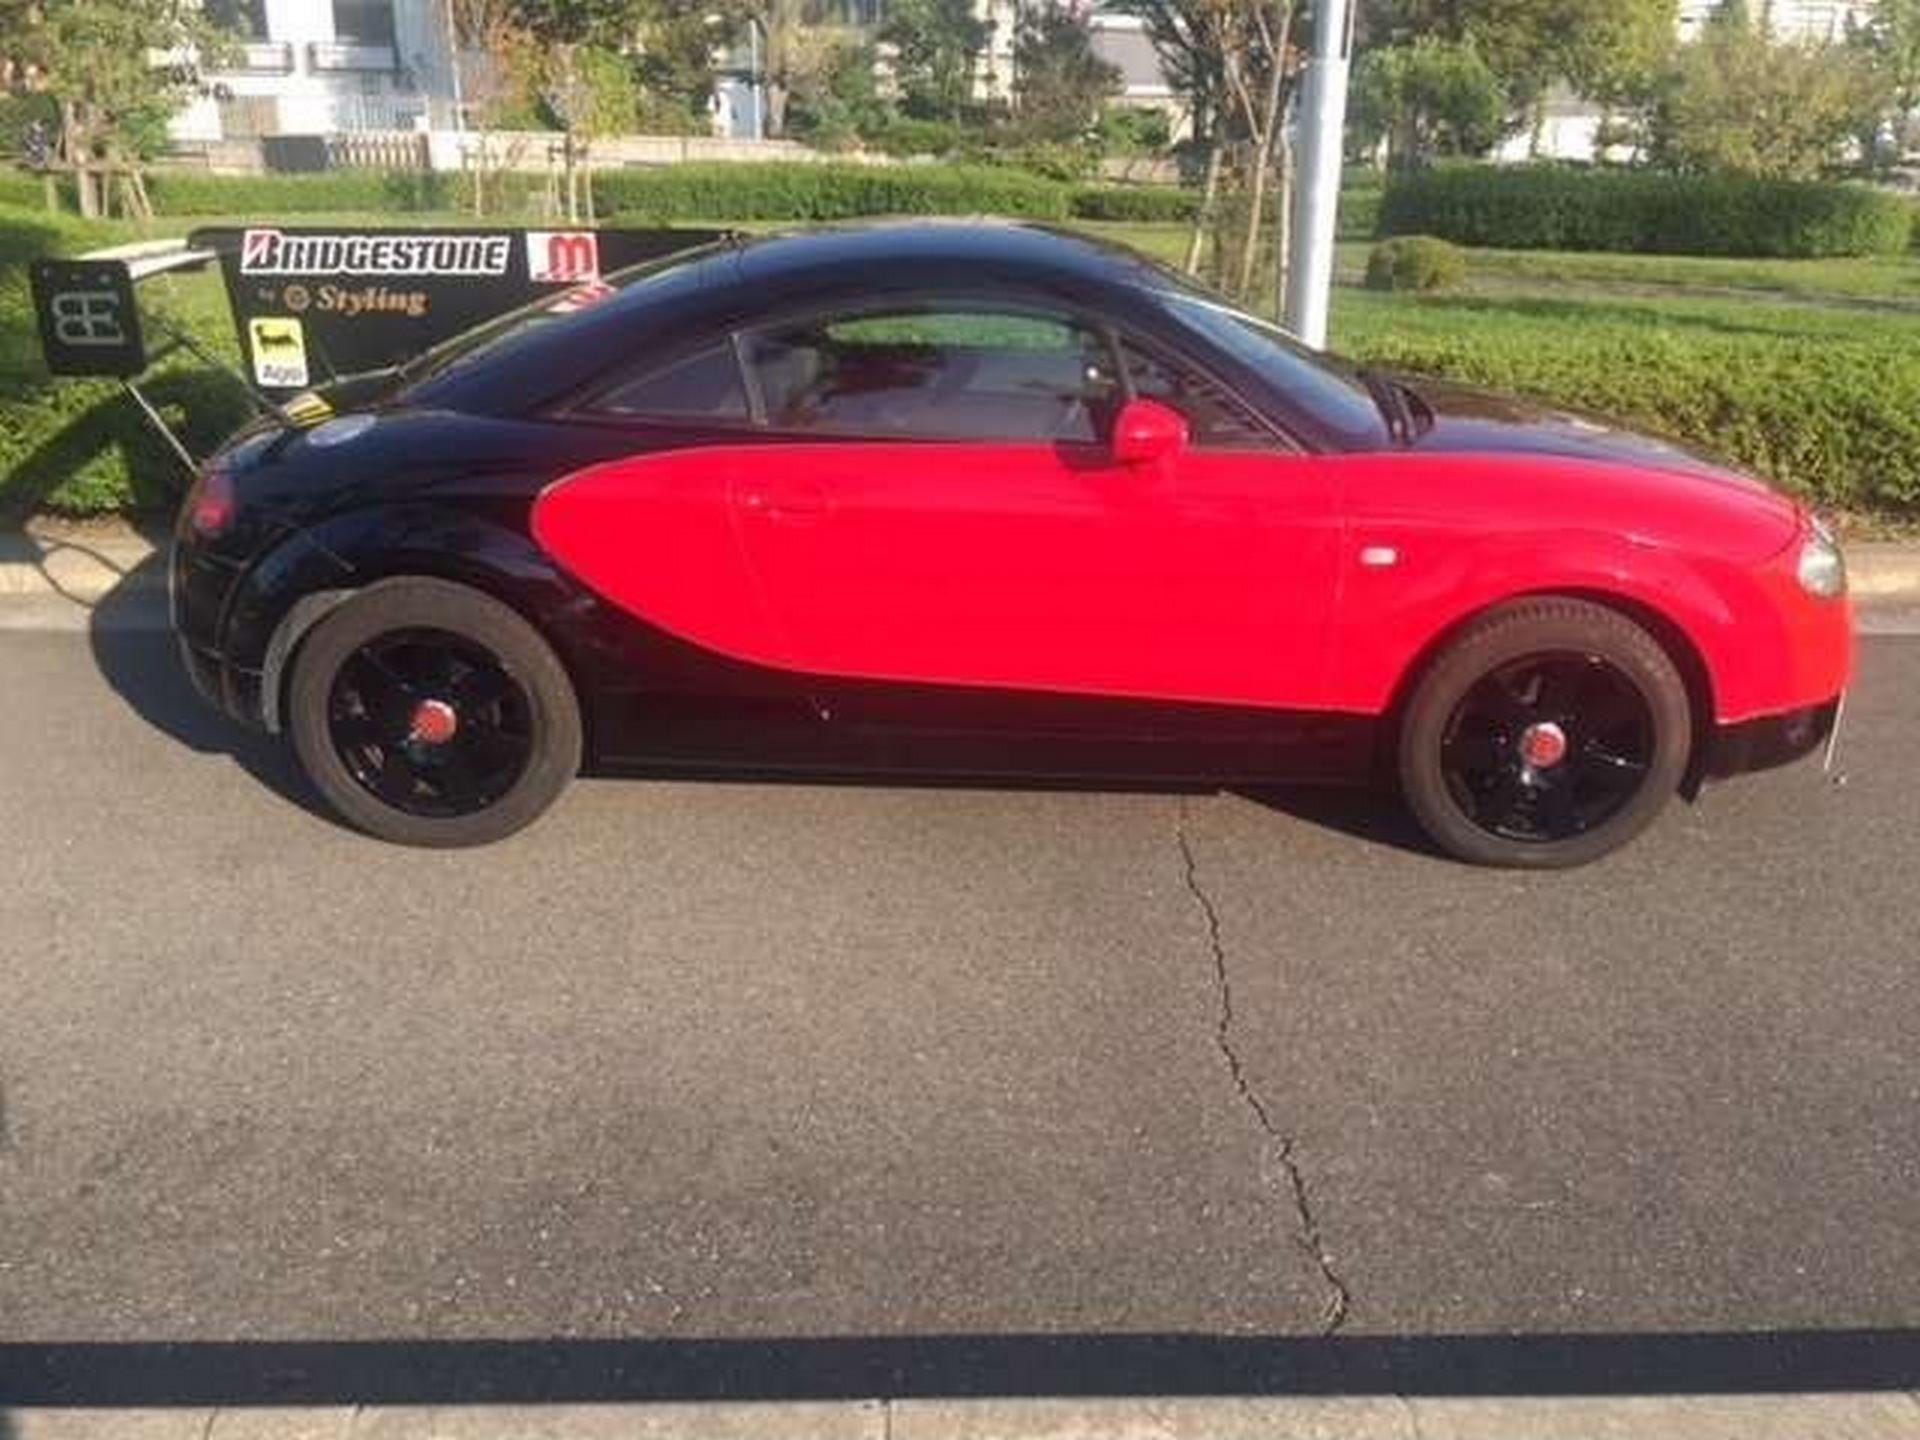 Audi-TT-Bugatti-Veyron-Replica-4